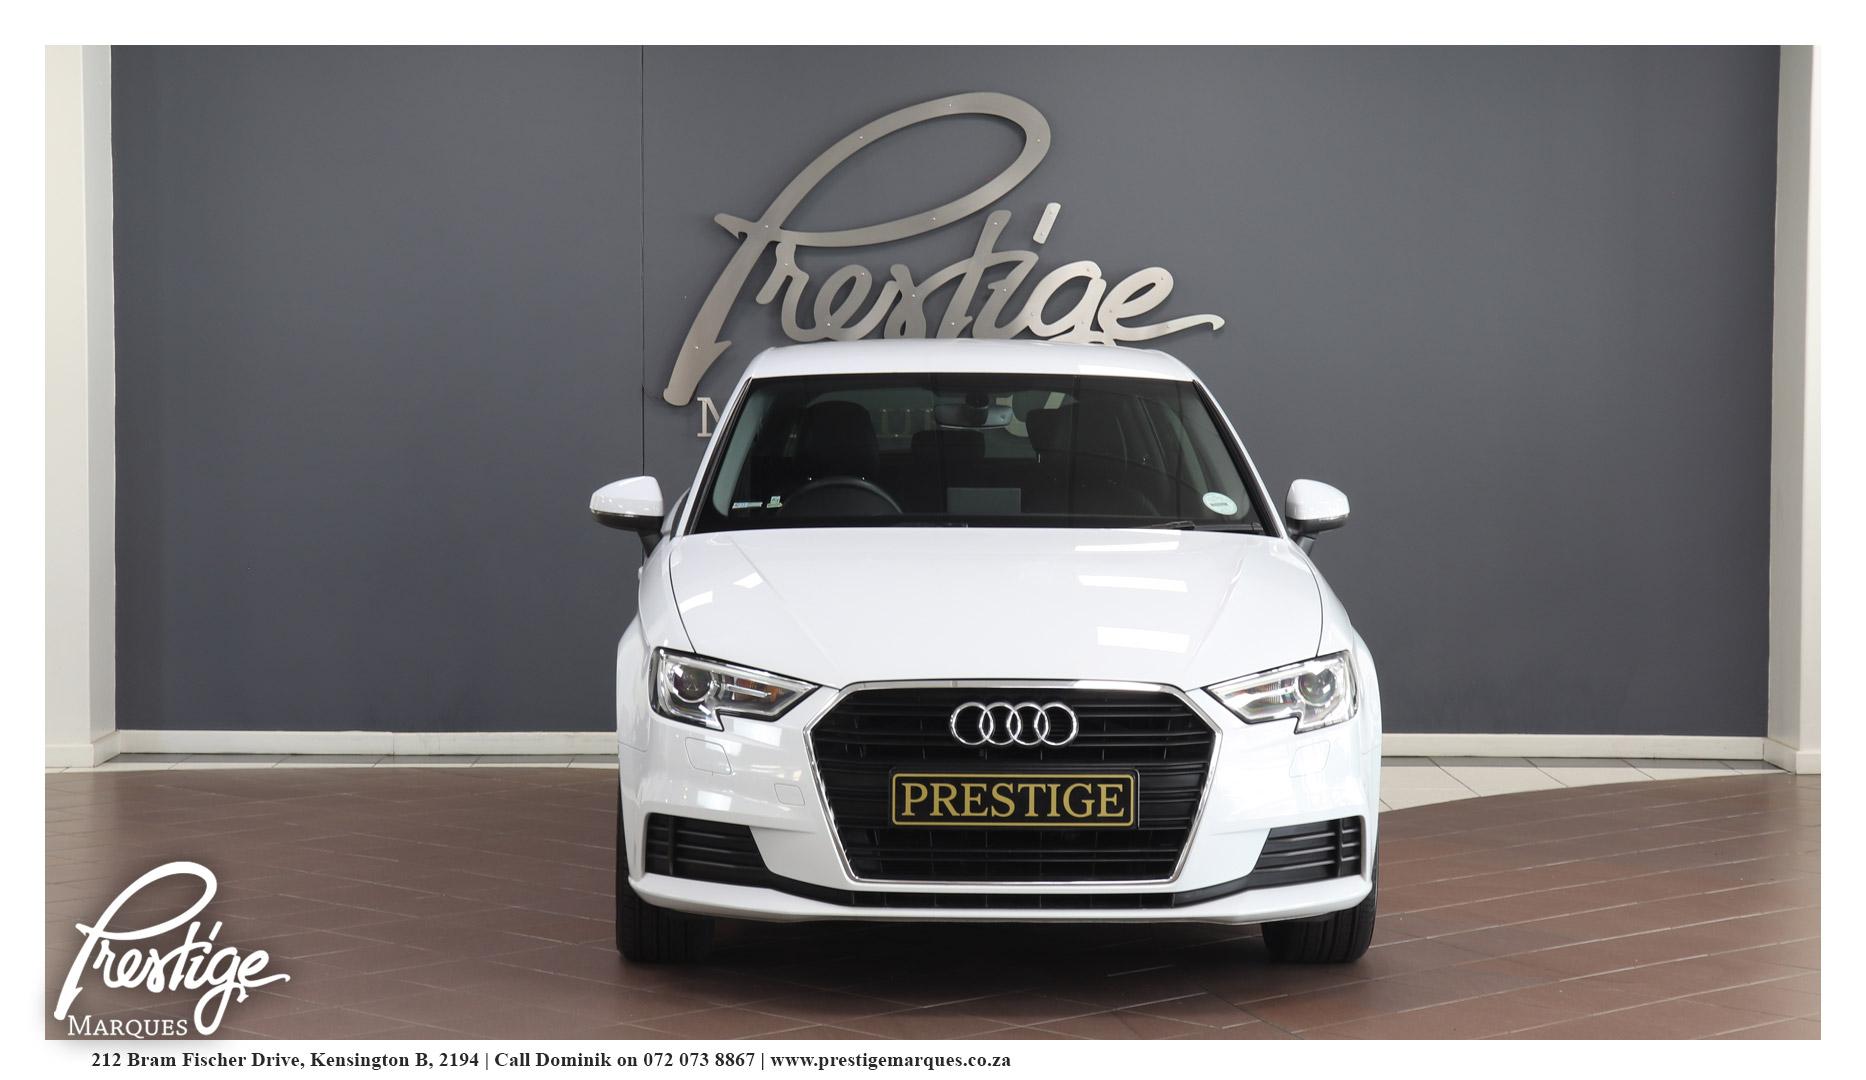 2017-Audi-A3-Sportback-1-4-TFSi-Stronic-Prestige-Marques-Randburg-Sandton-9